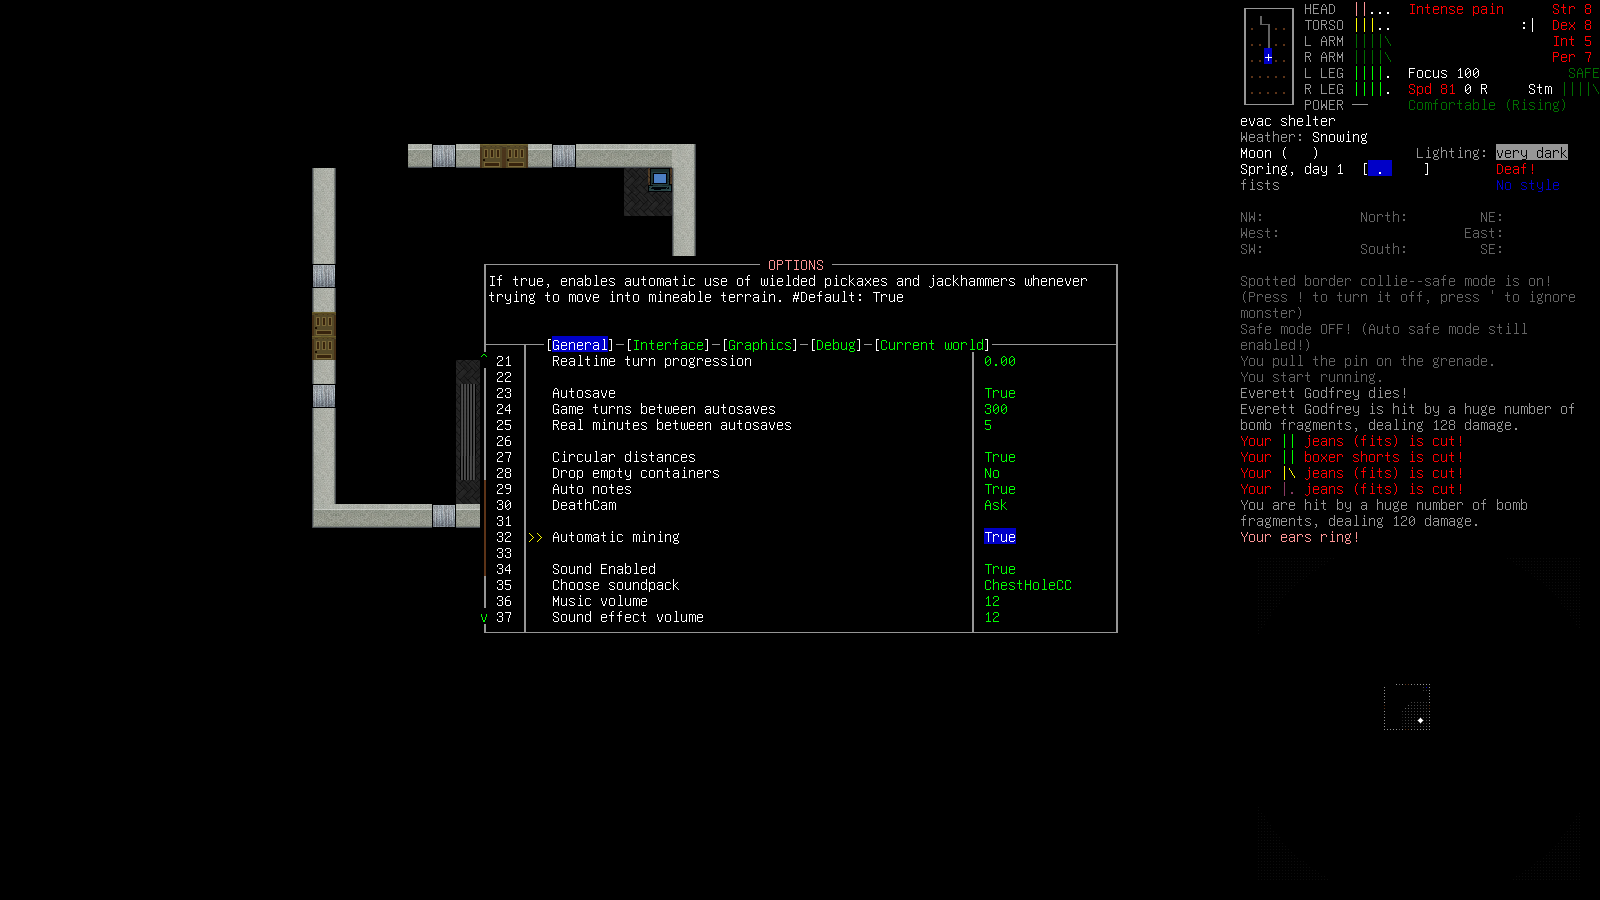 screenshot 37